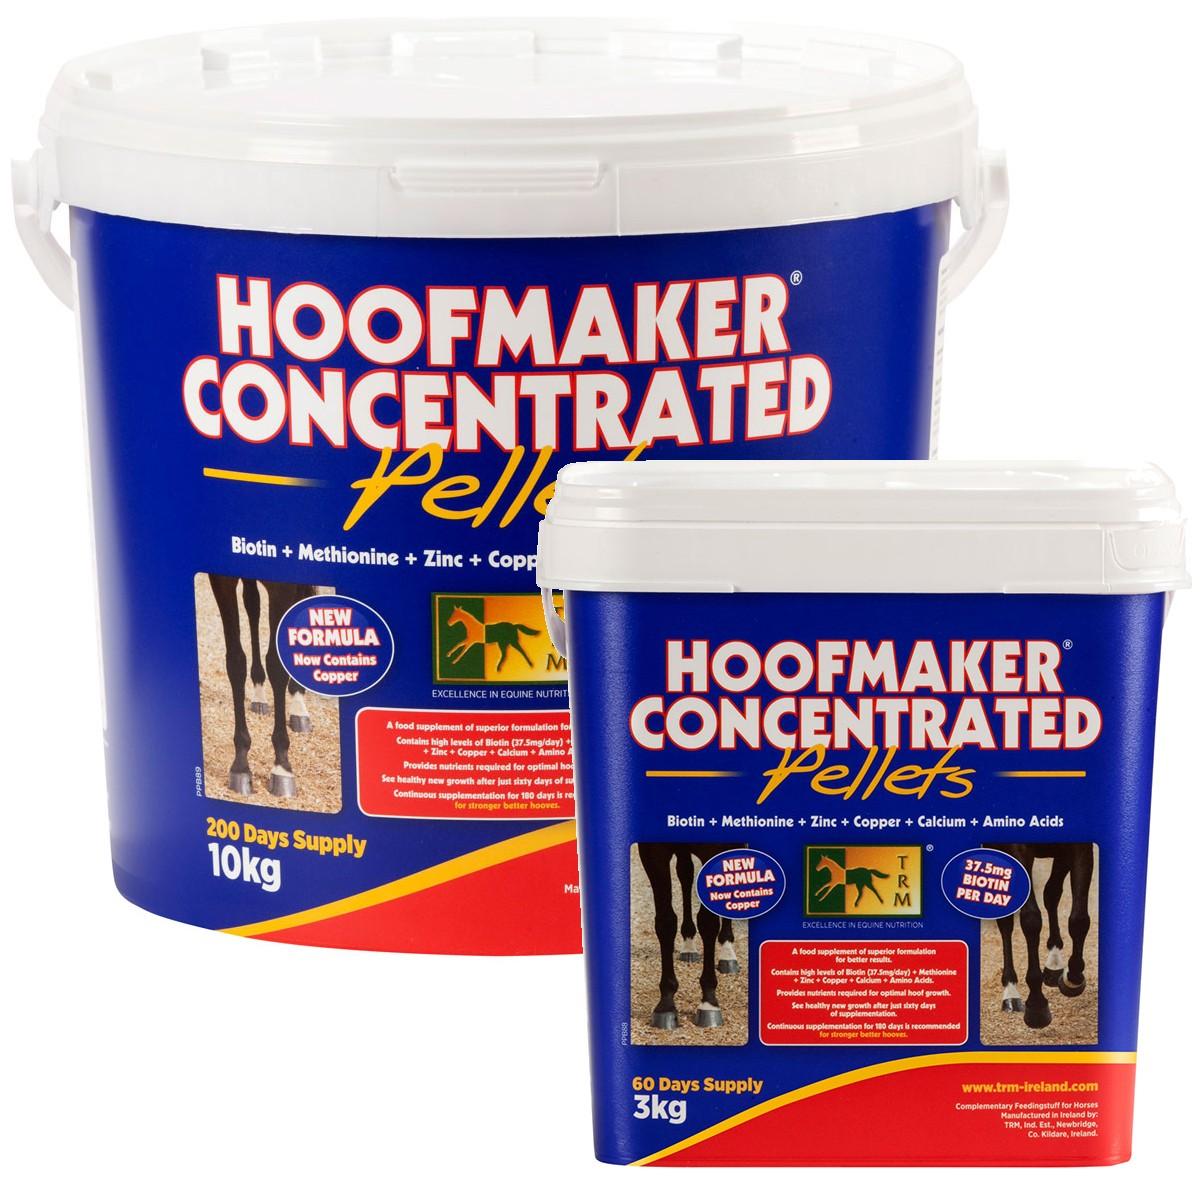 TRM Hoofmaker Concentrated Pellets Supplement